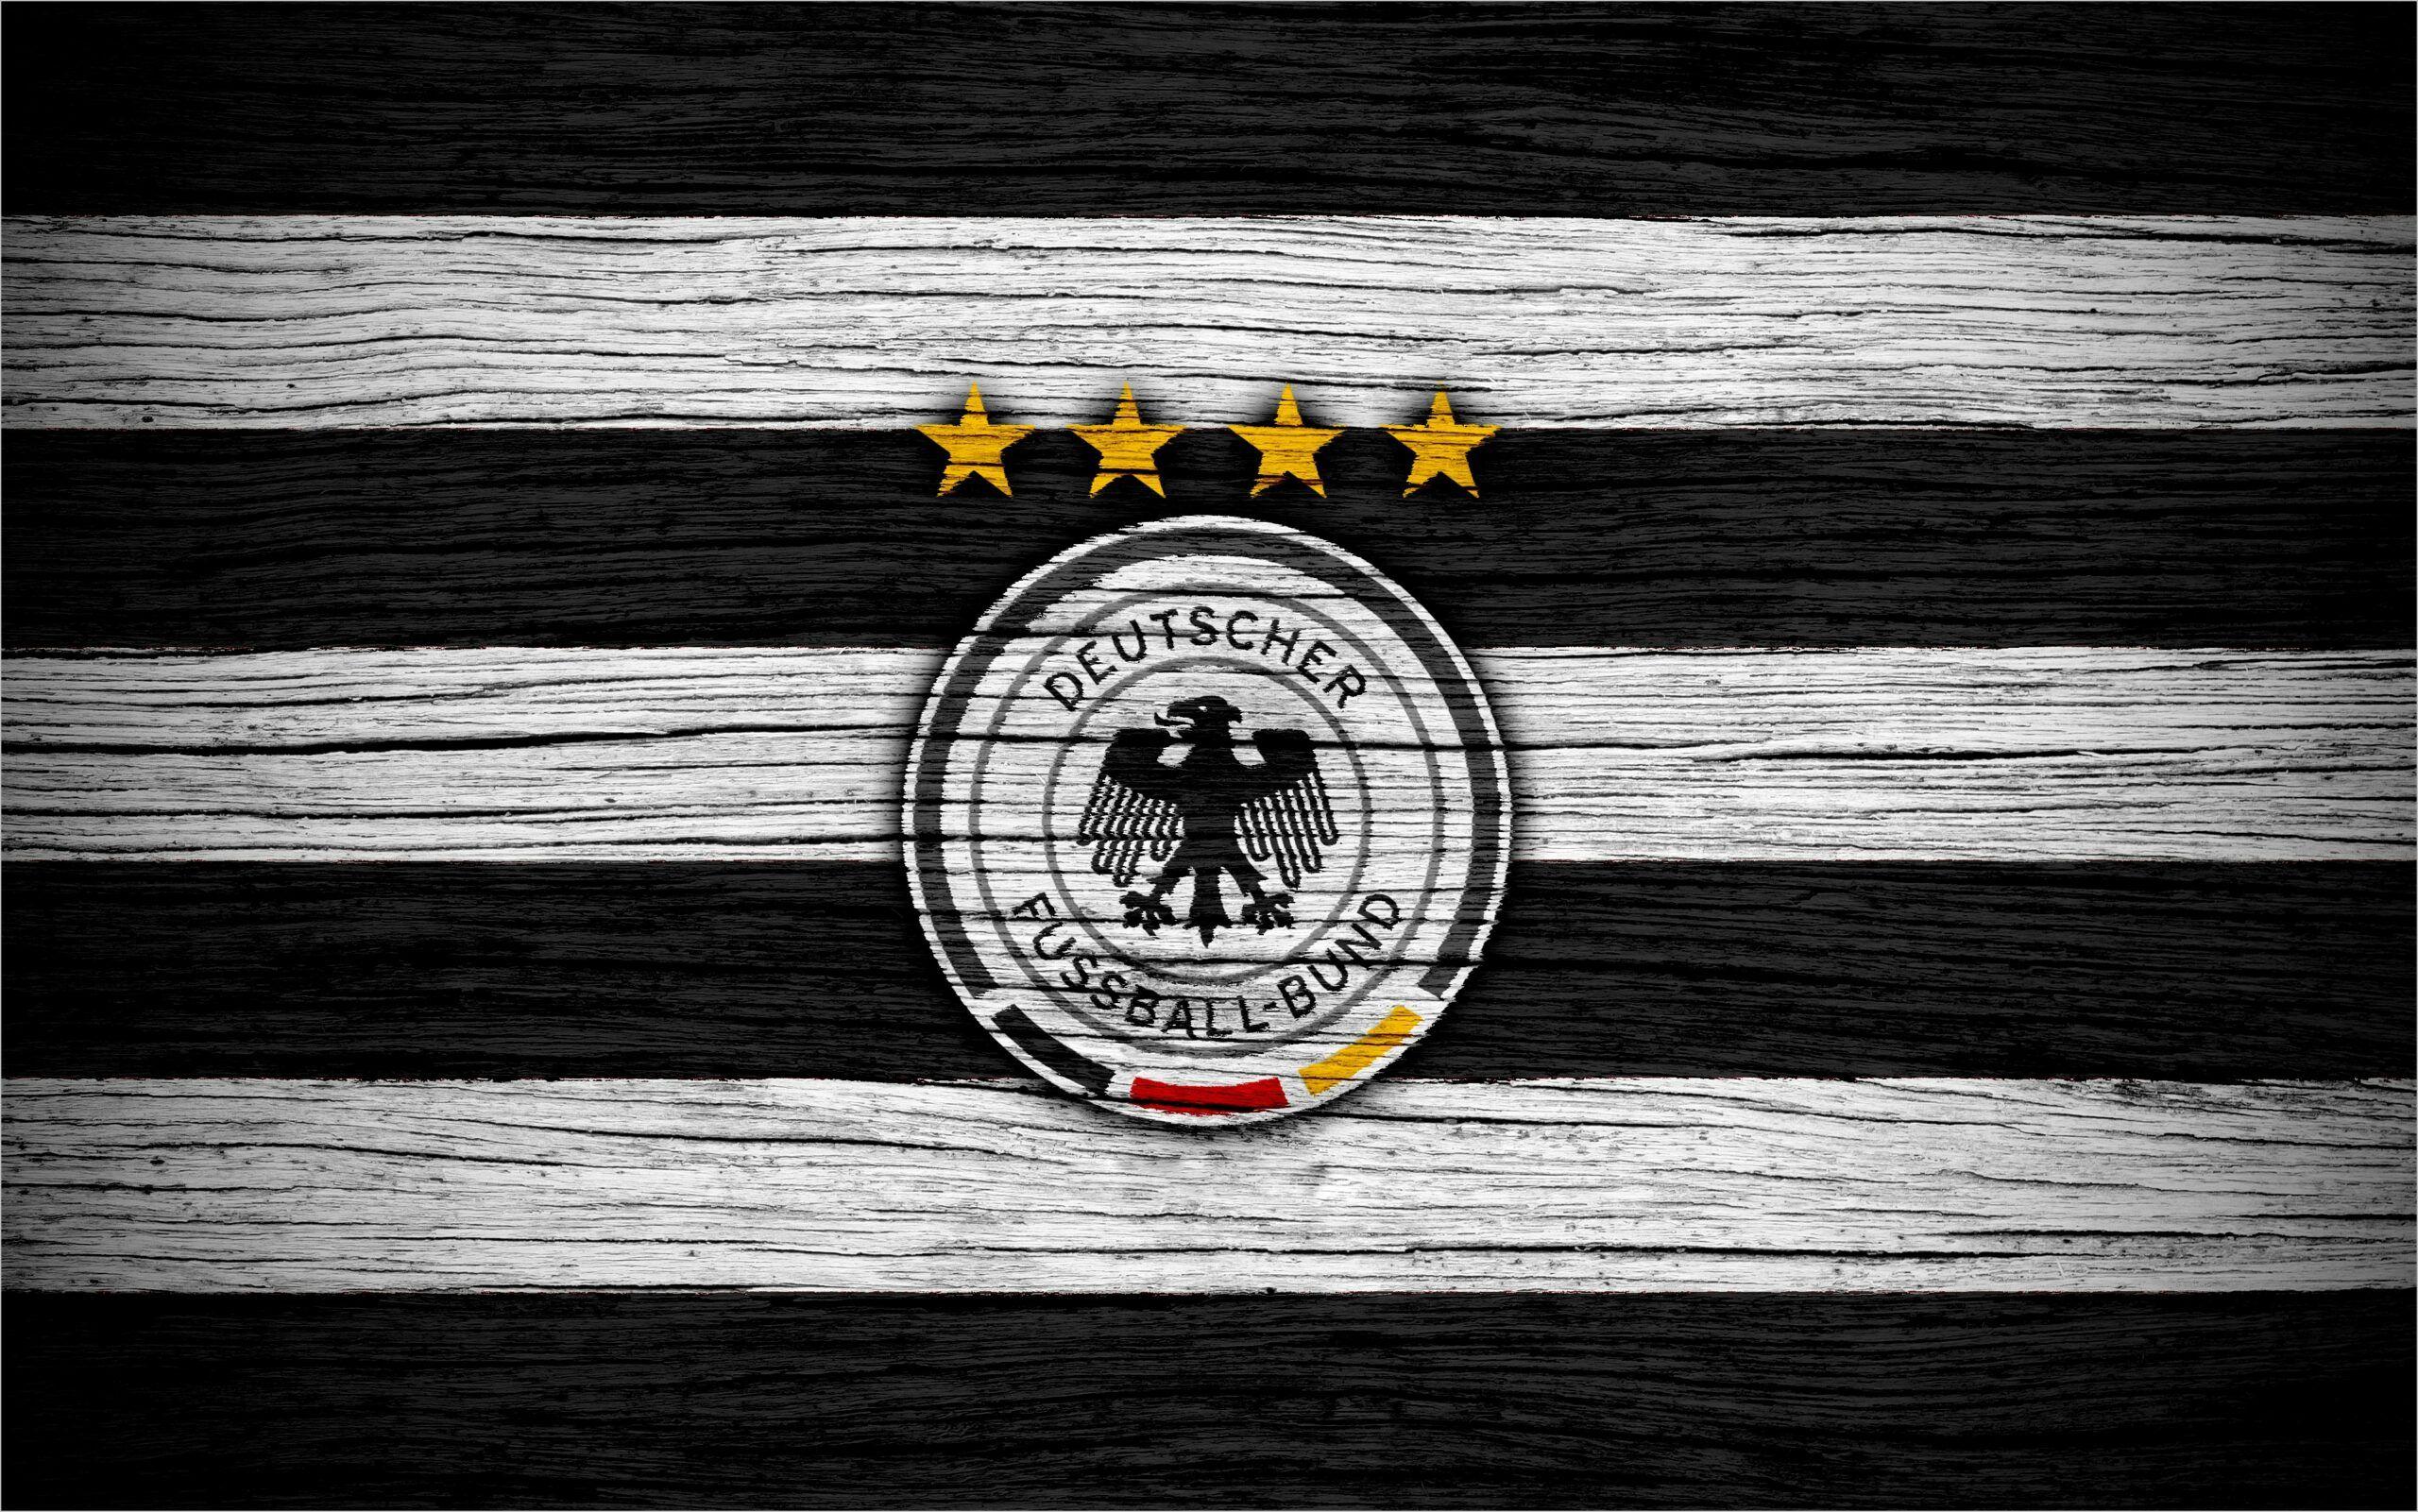 Germany Football Team 4k Wallpaper In 2020 Germany Football Germany National Football Team Germany Football Team